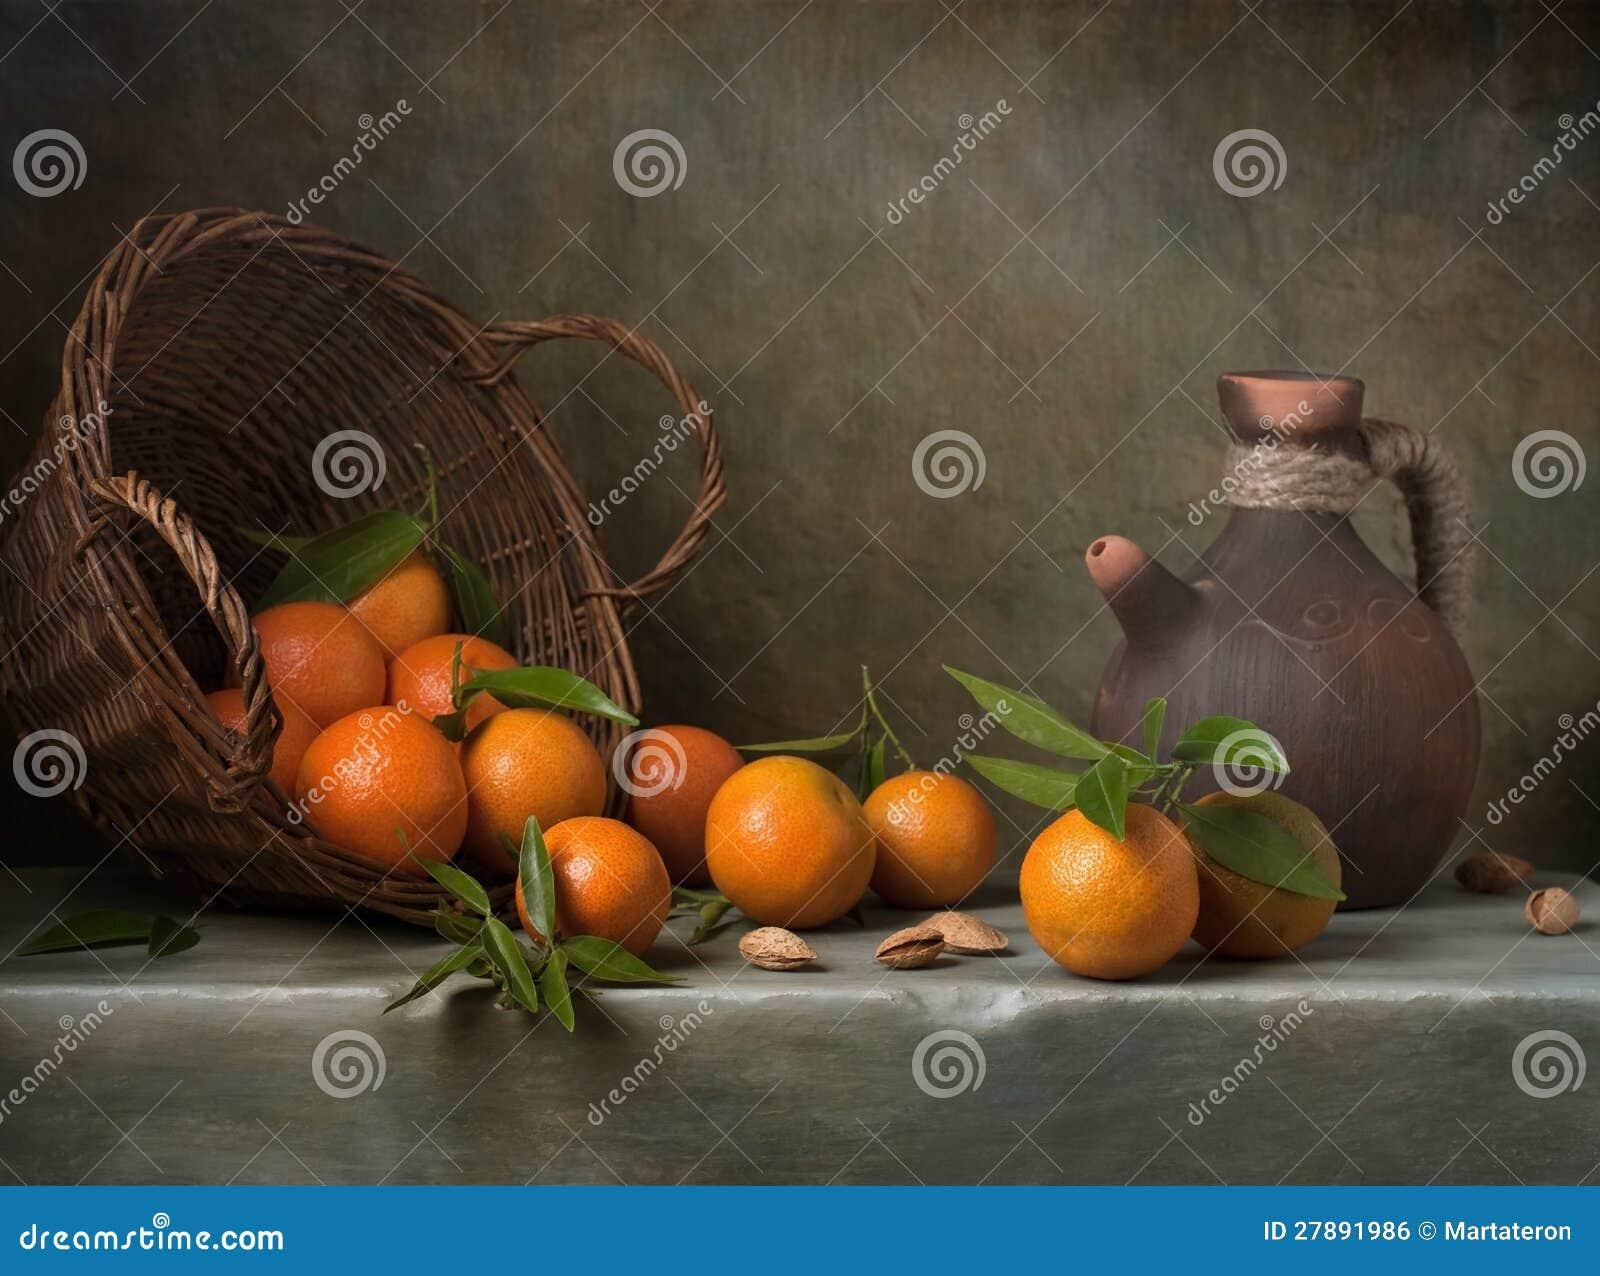 Still life with tangerines